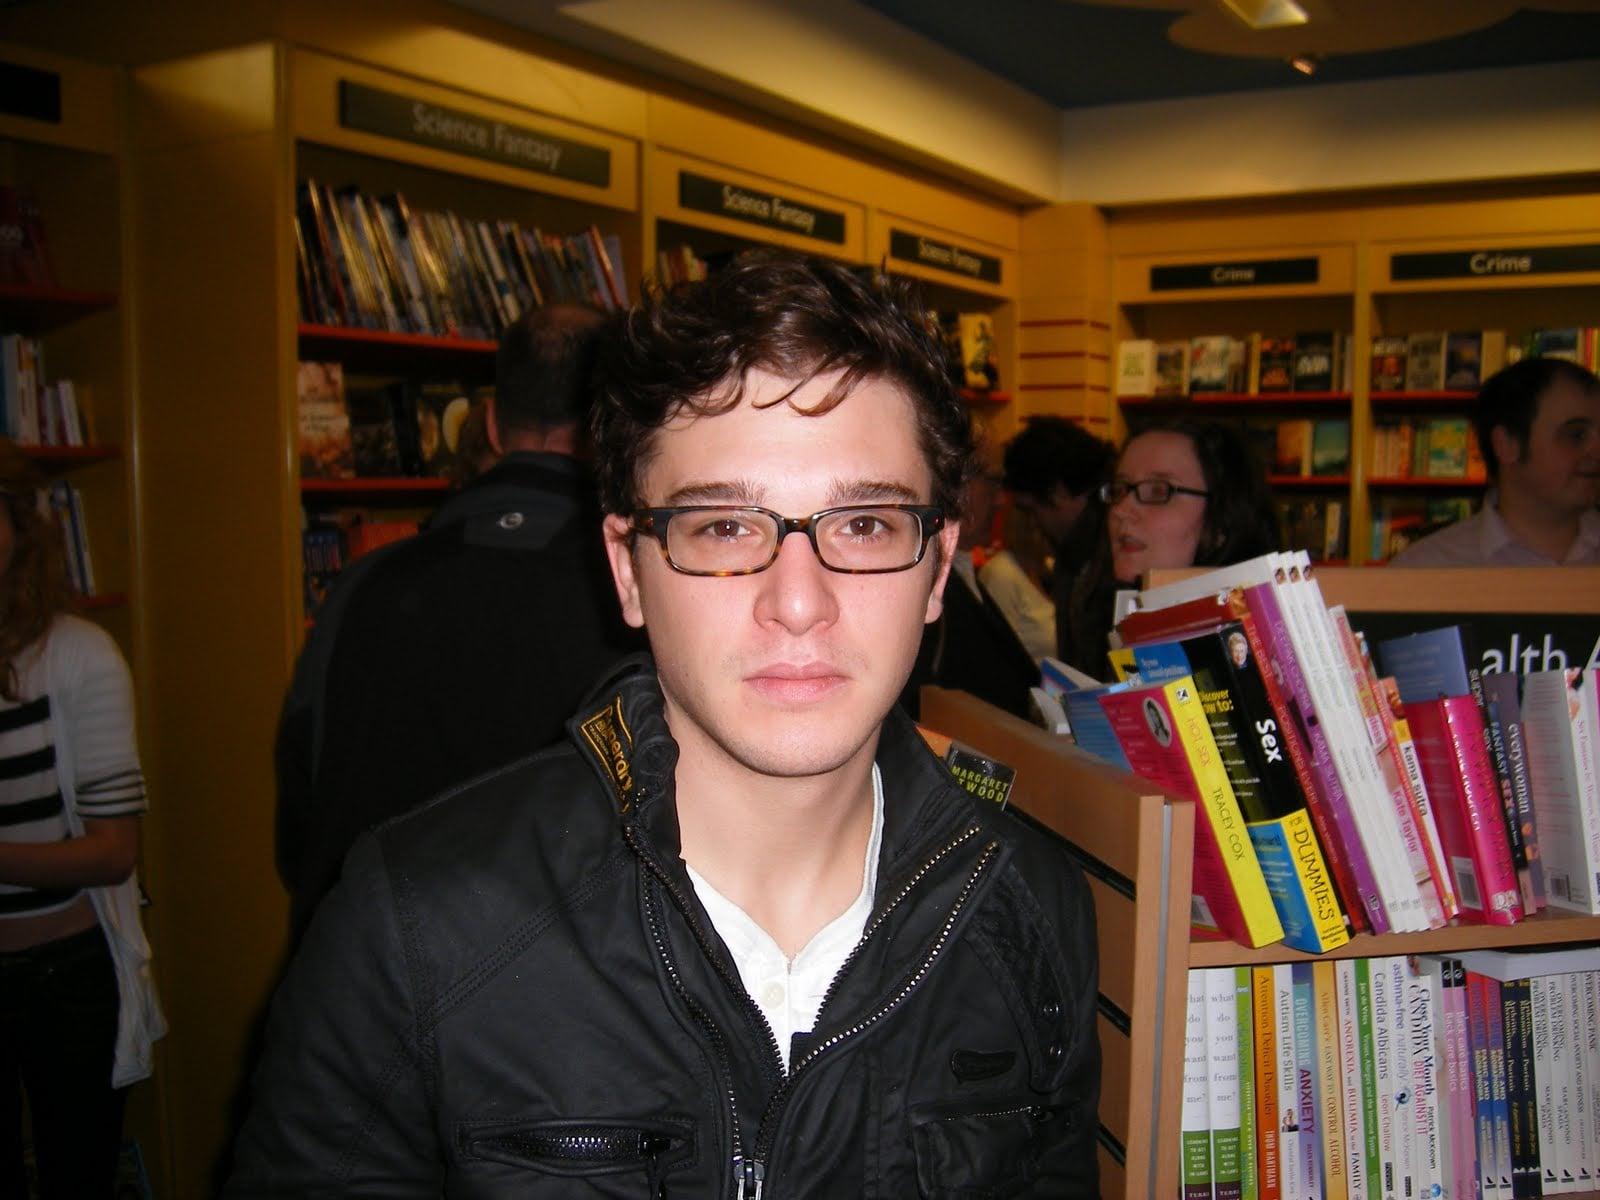 Kit Harington (Jon Snow) — NONE OF US CAN HANDLE ANYTHING. Source: Blogspot user thewertzone